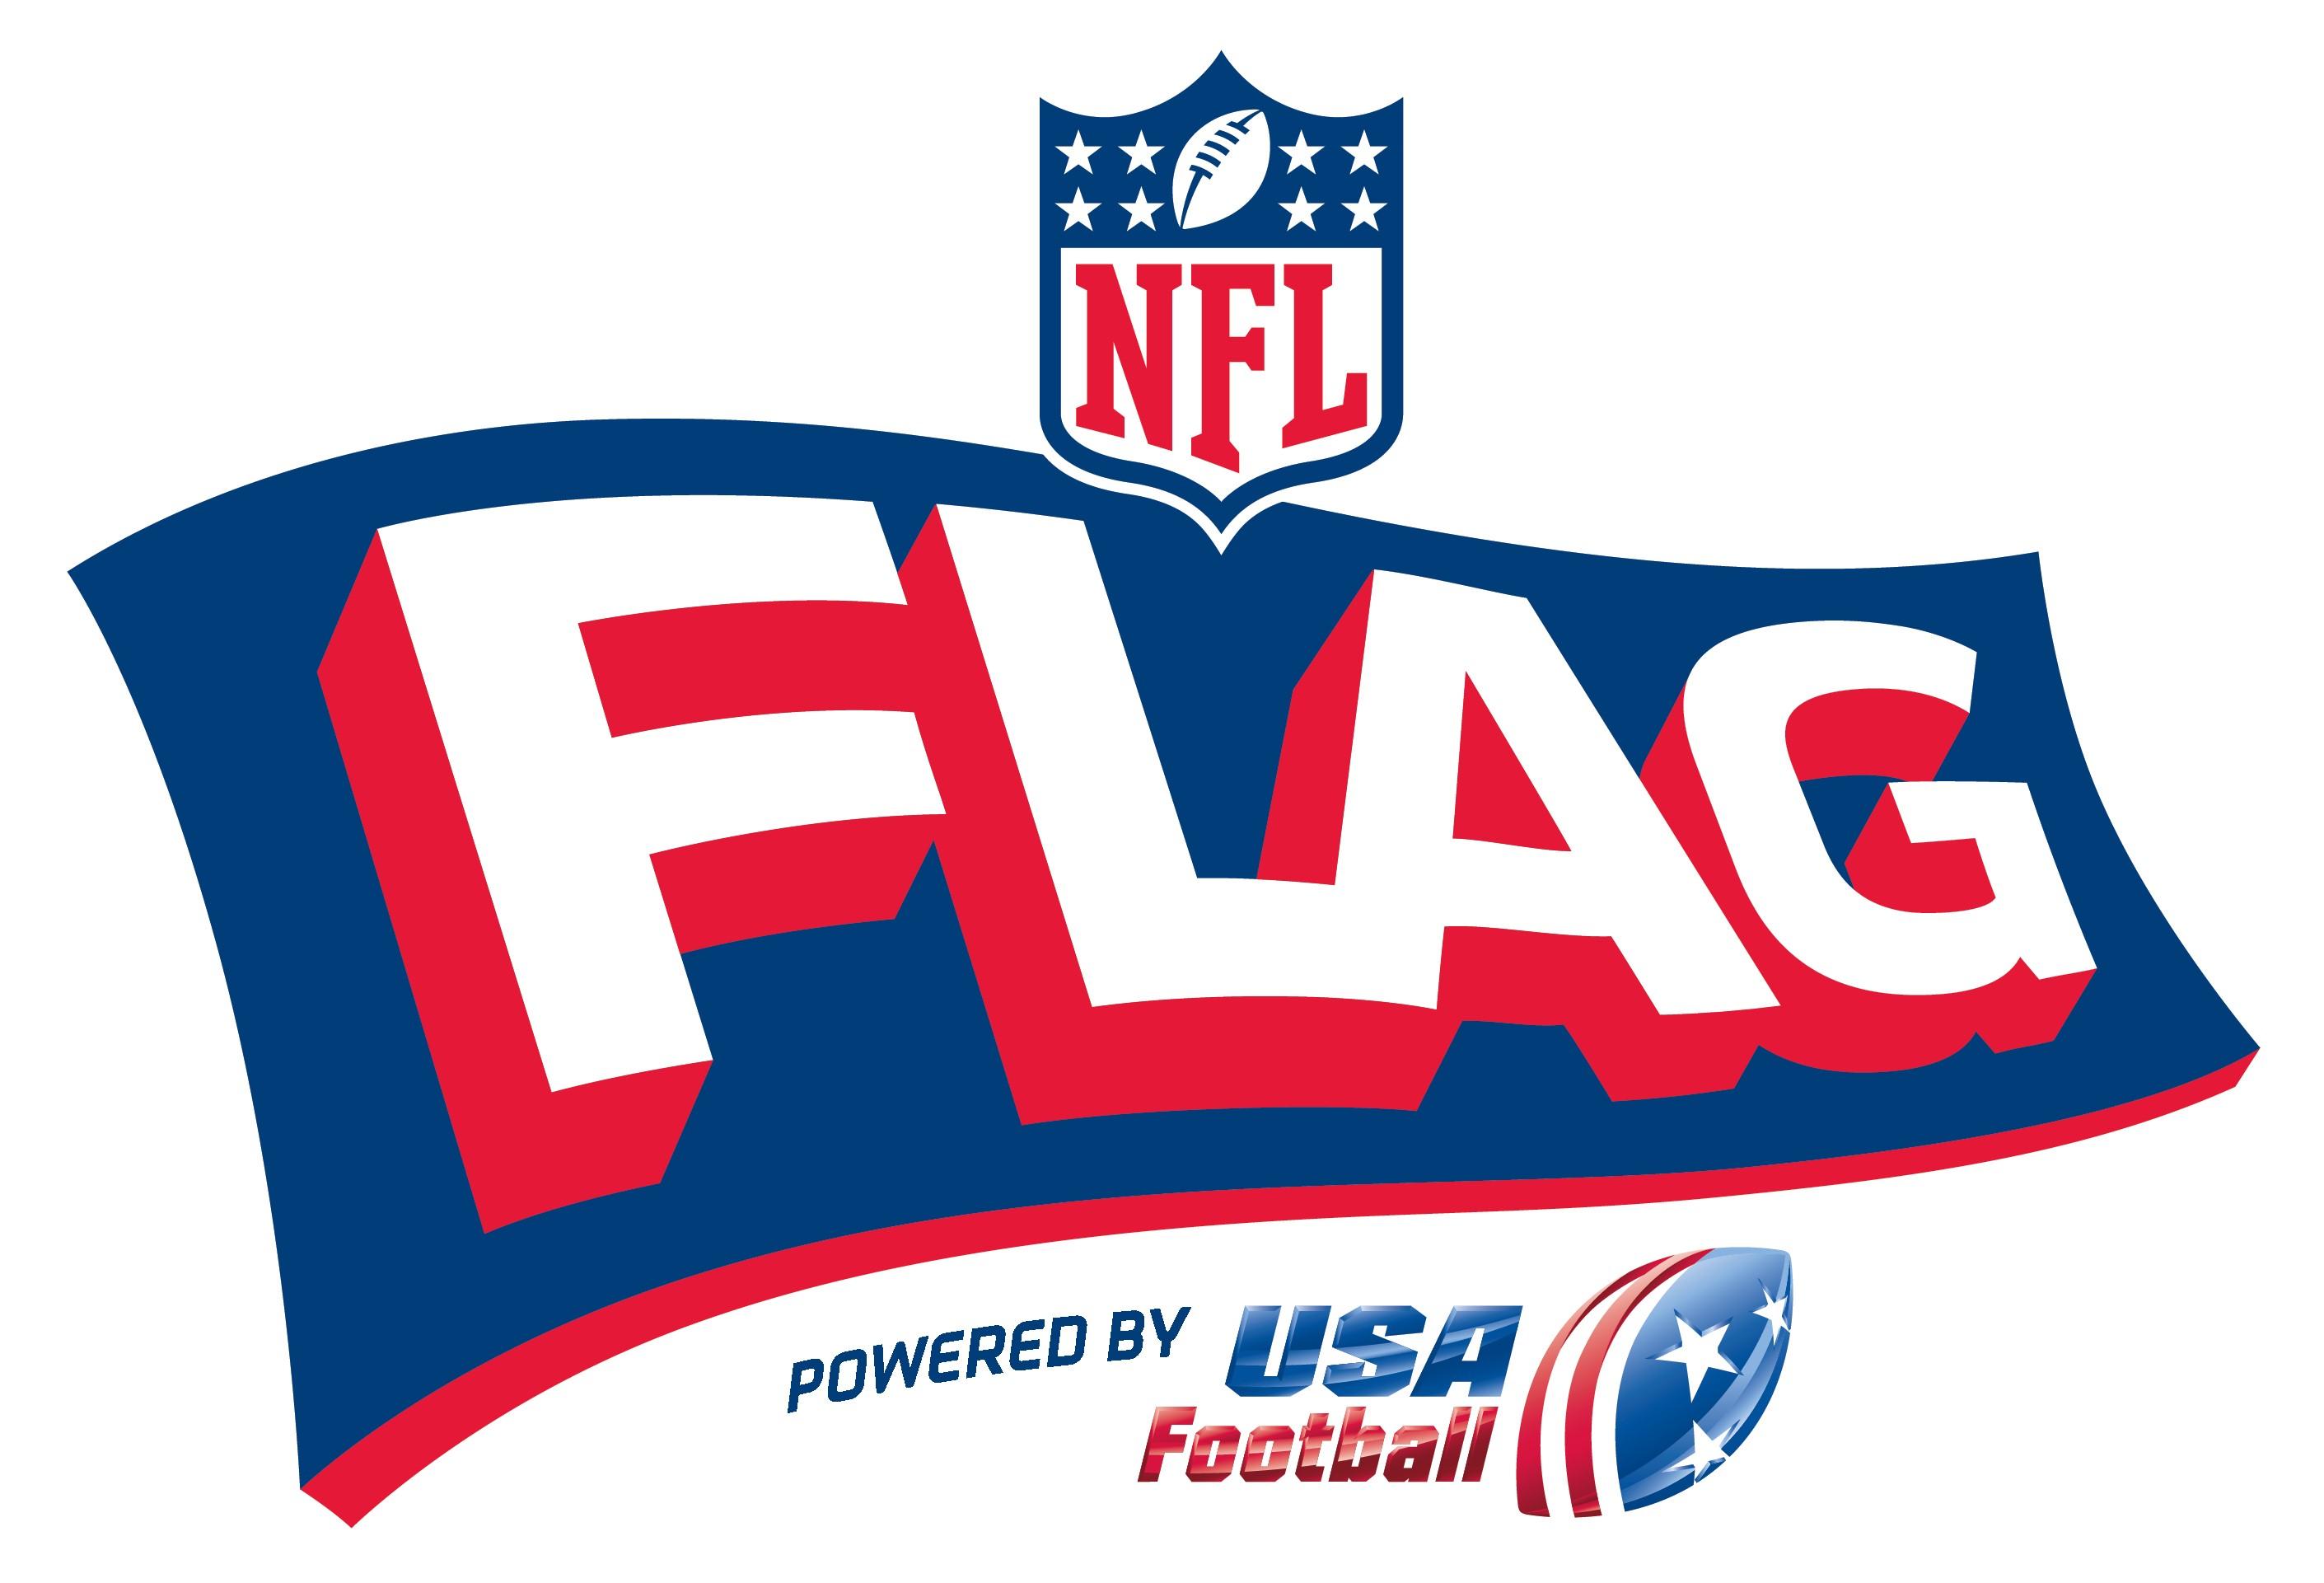 NFL Flag Football